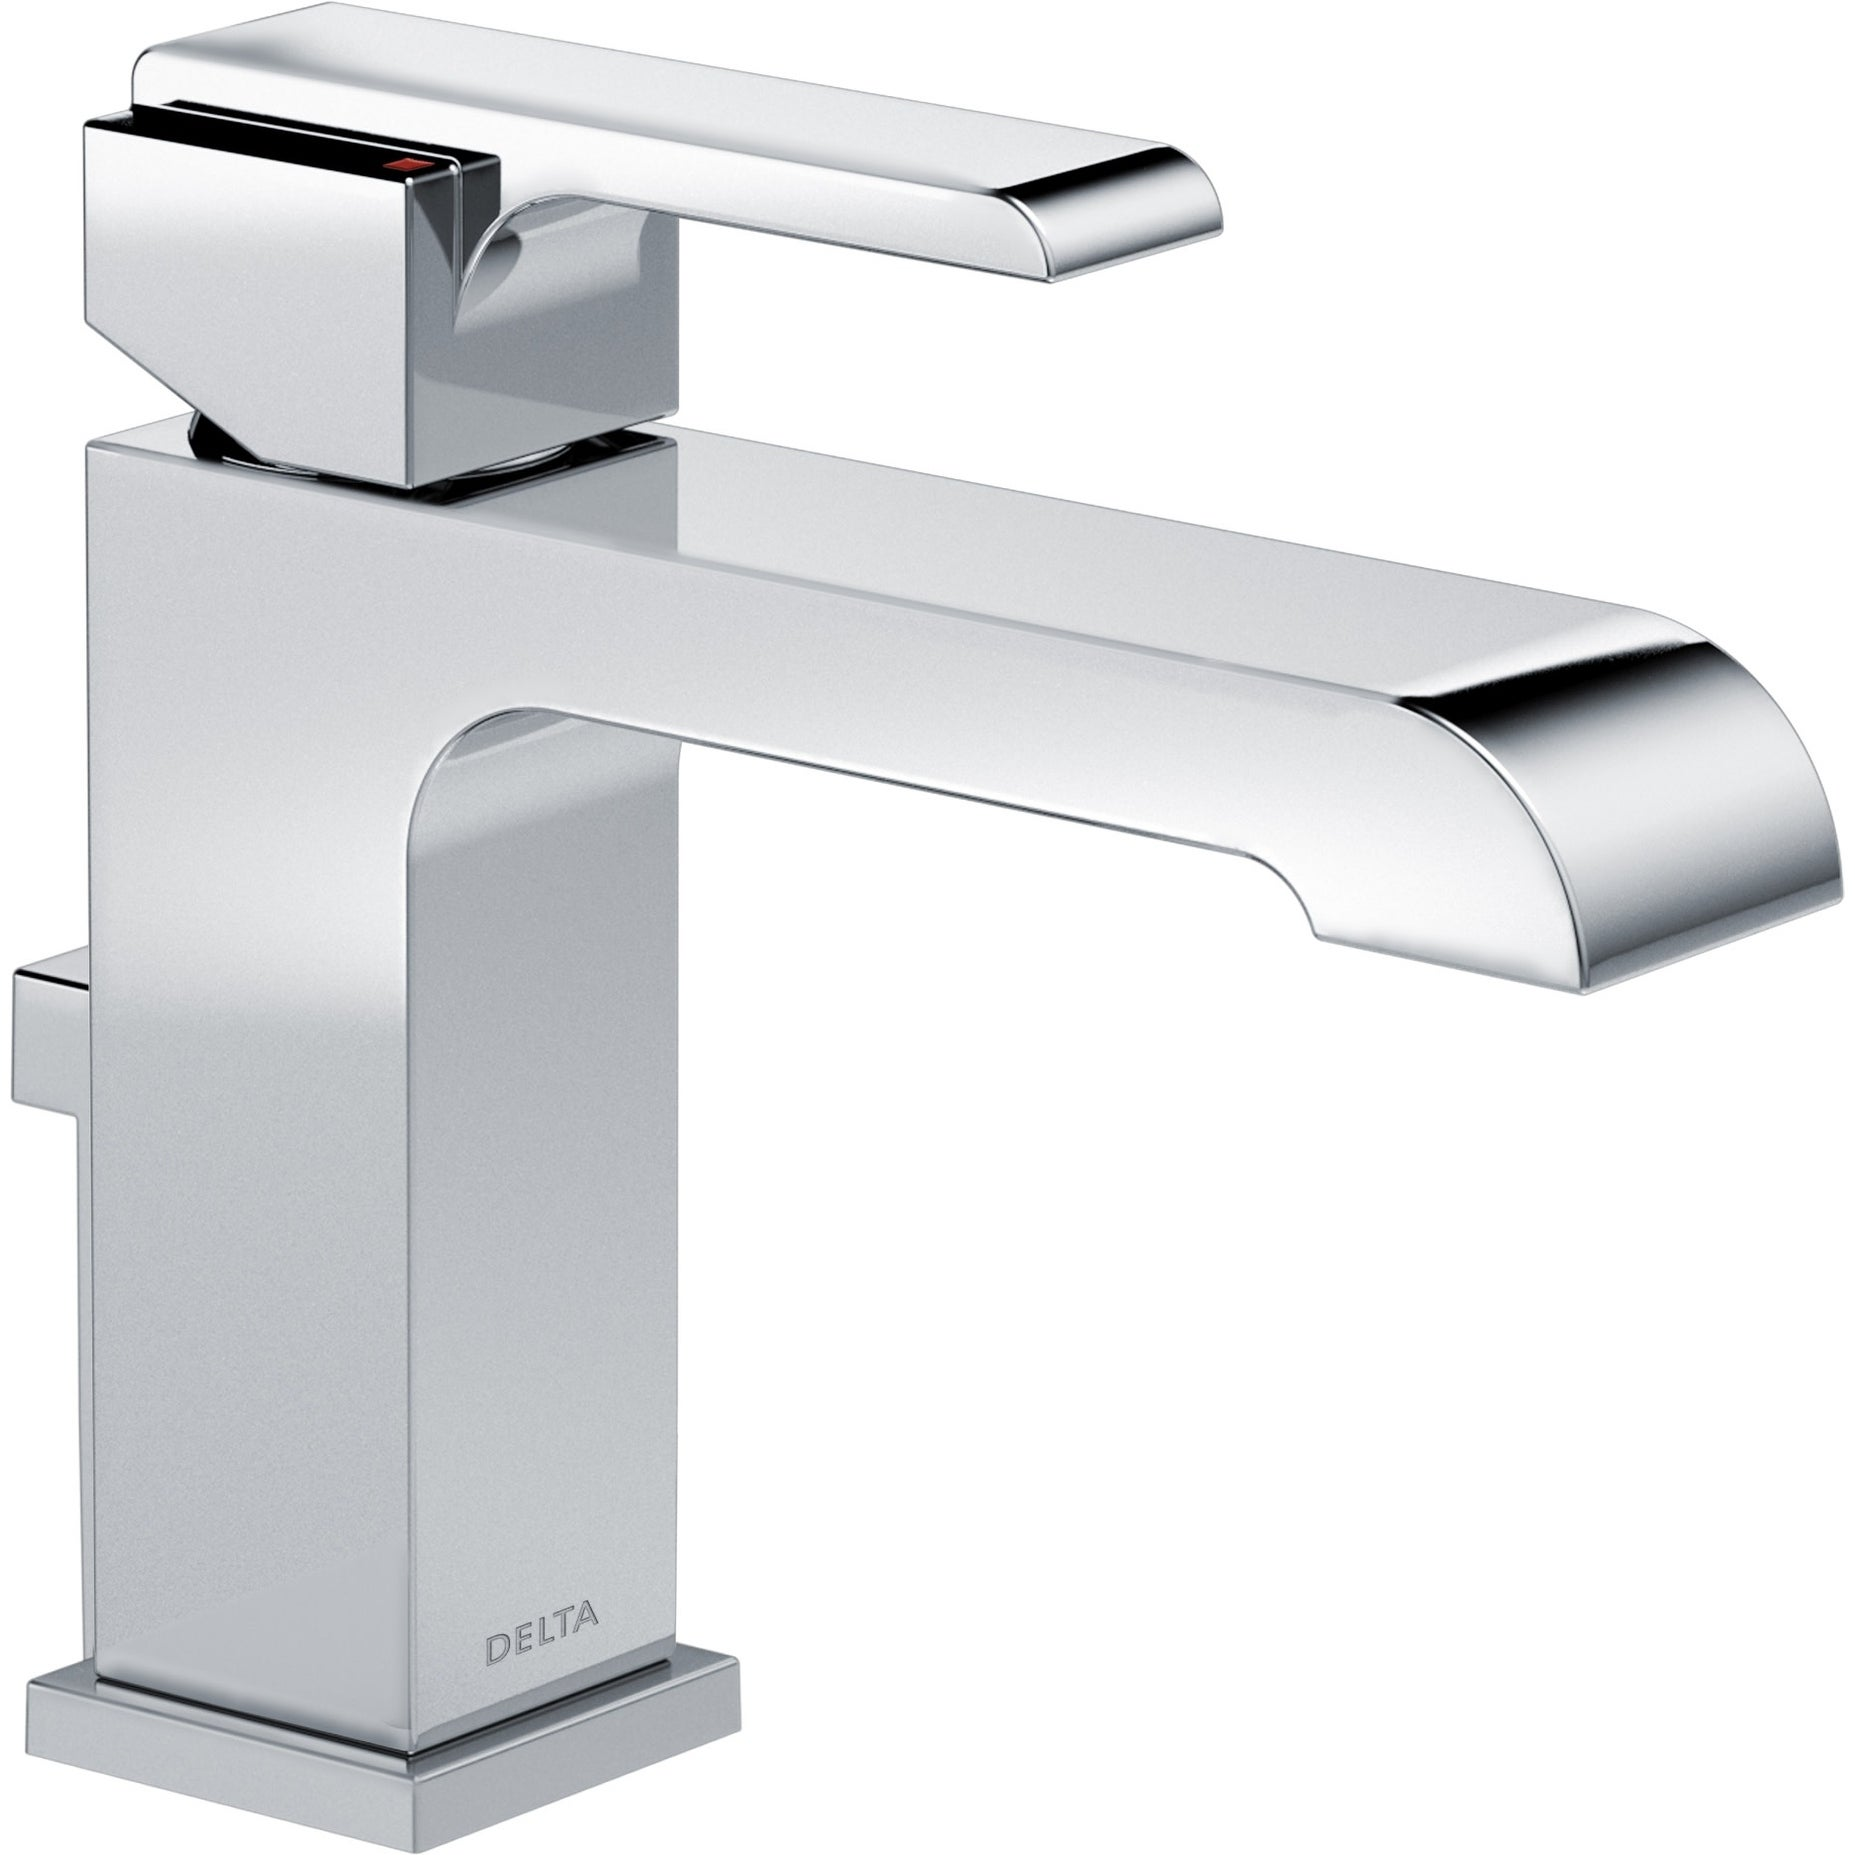 Delta 567lf Tp Ara Centerset Bathroom Faucet Includes Drain Assembly Chrome On Sale Overstock 16373483